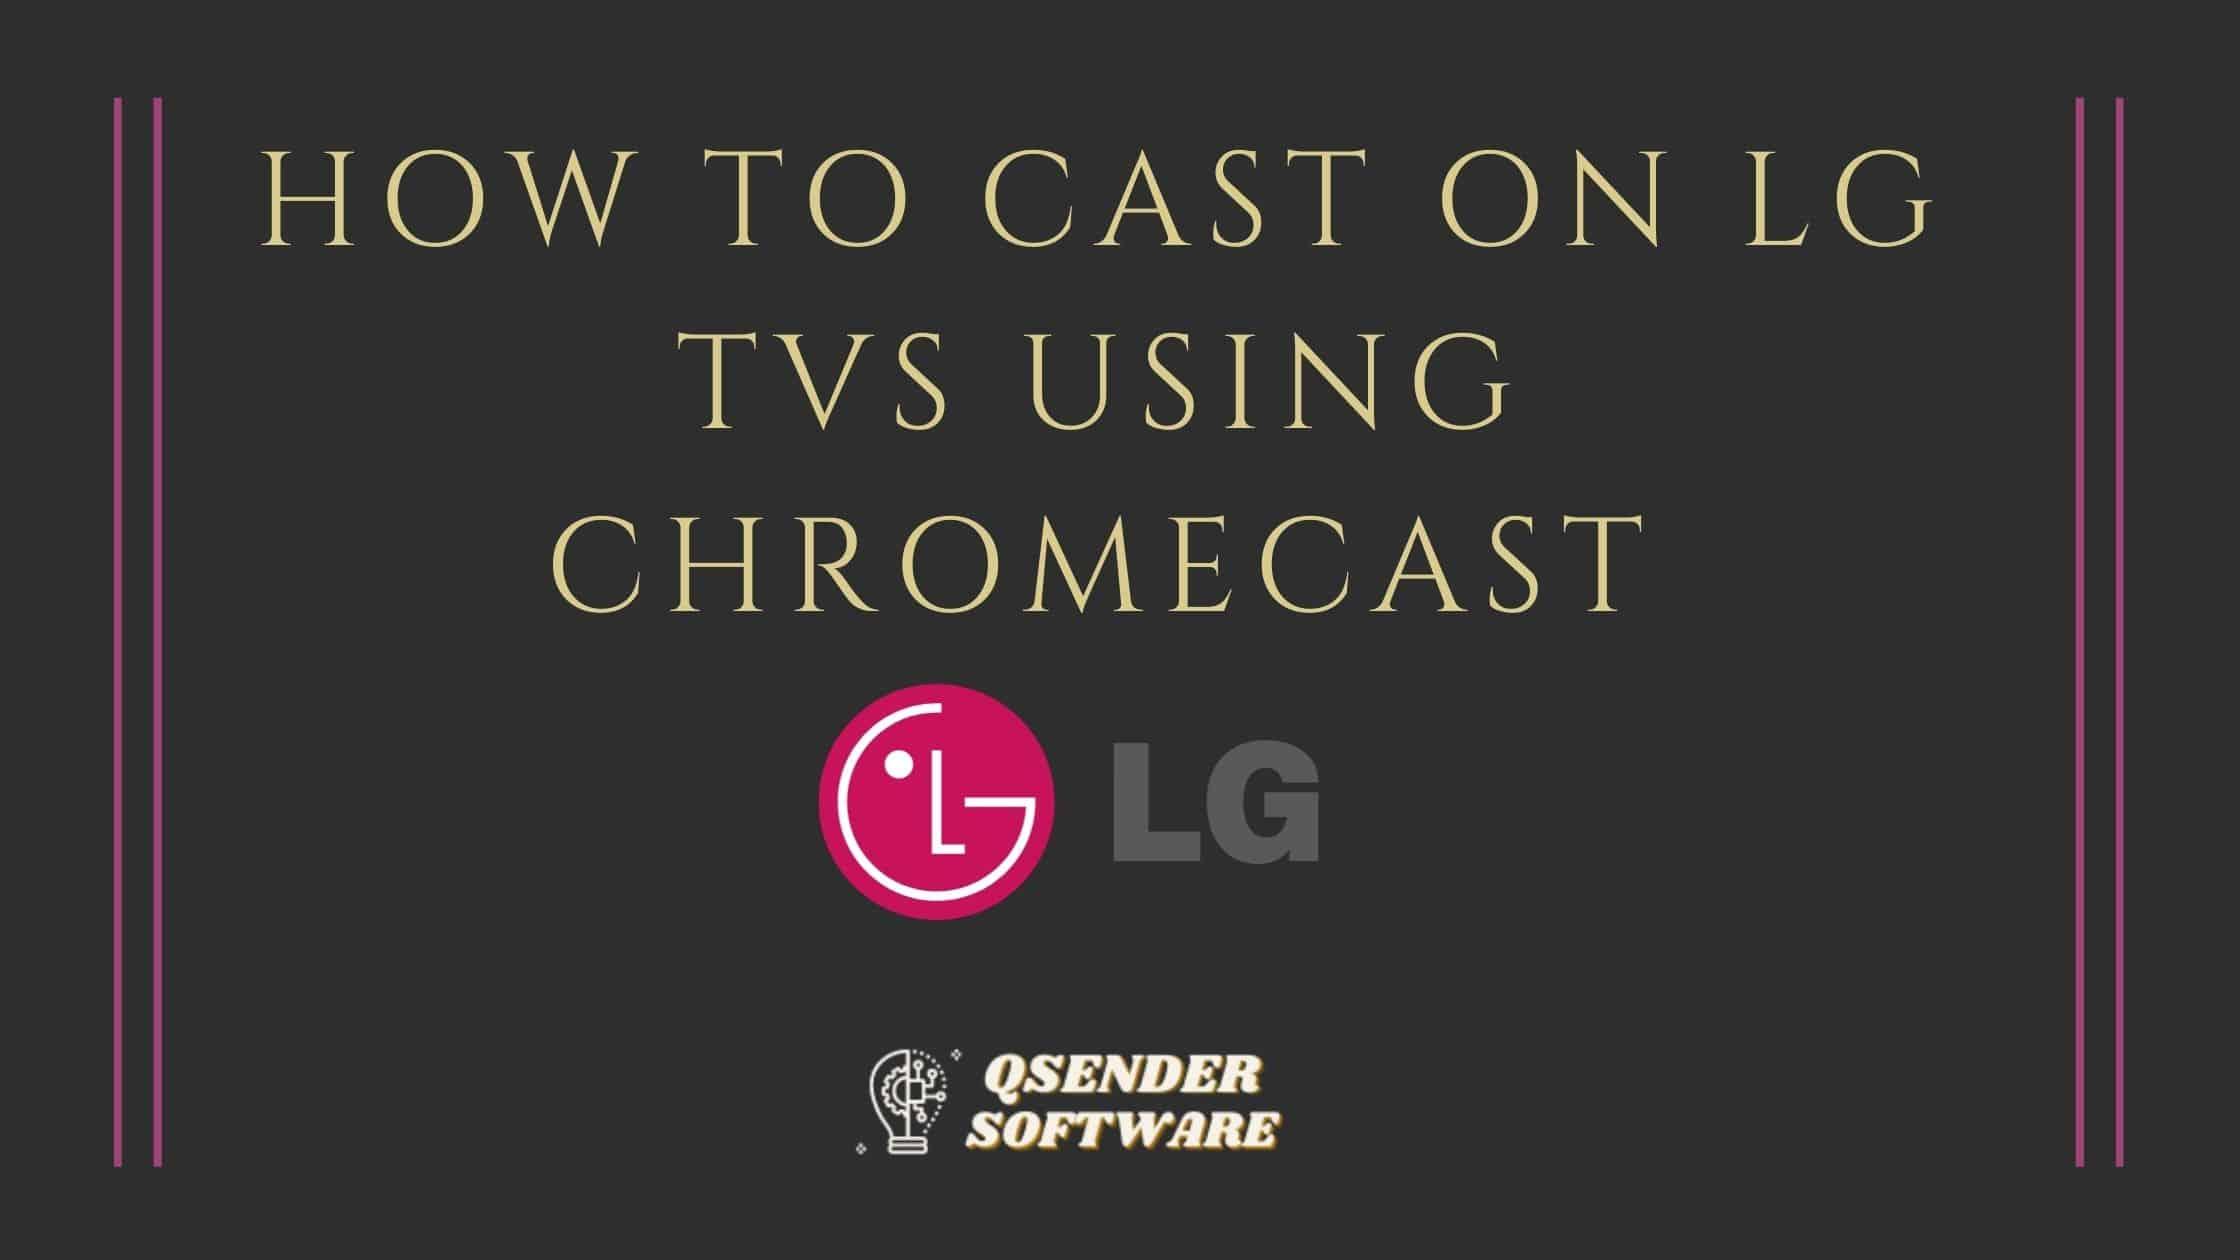 How To Cast On LG TVs Using Chromecast